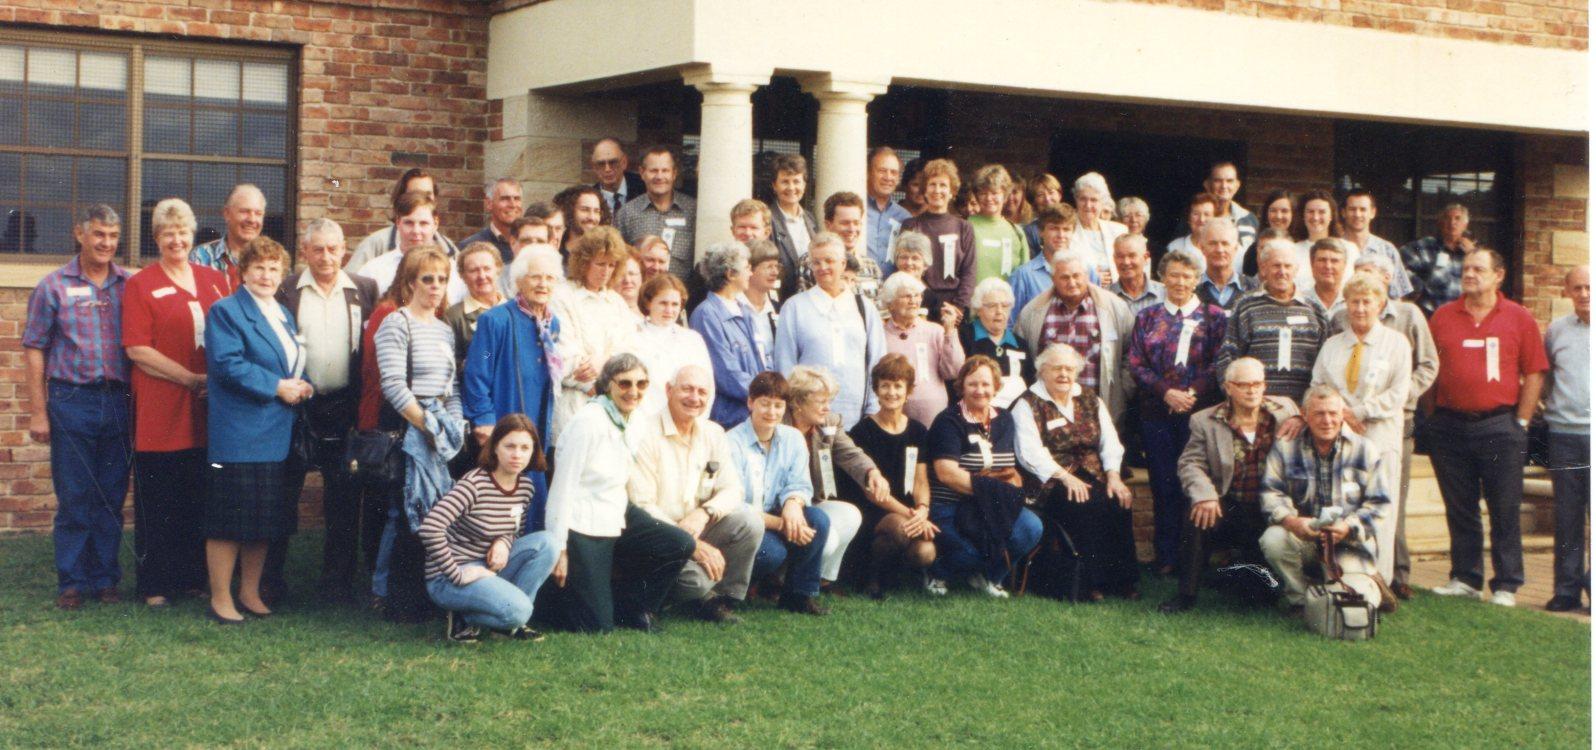 Ambervale Reunion - Benjamin descendants thanks to Joye Walsh